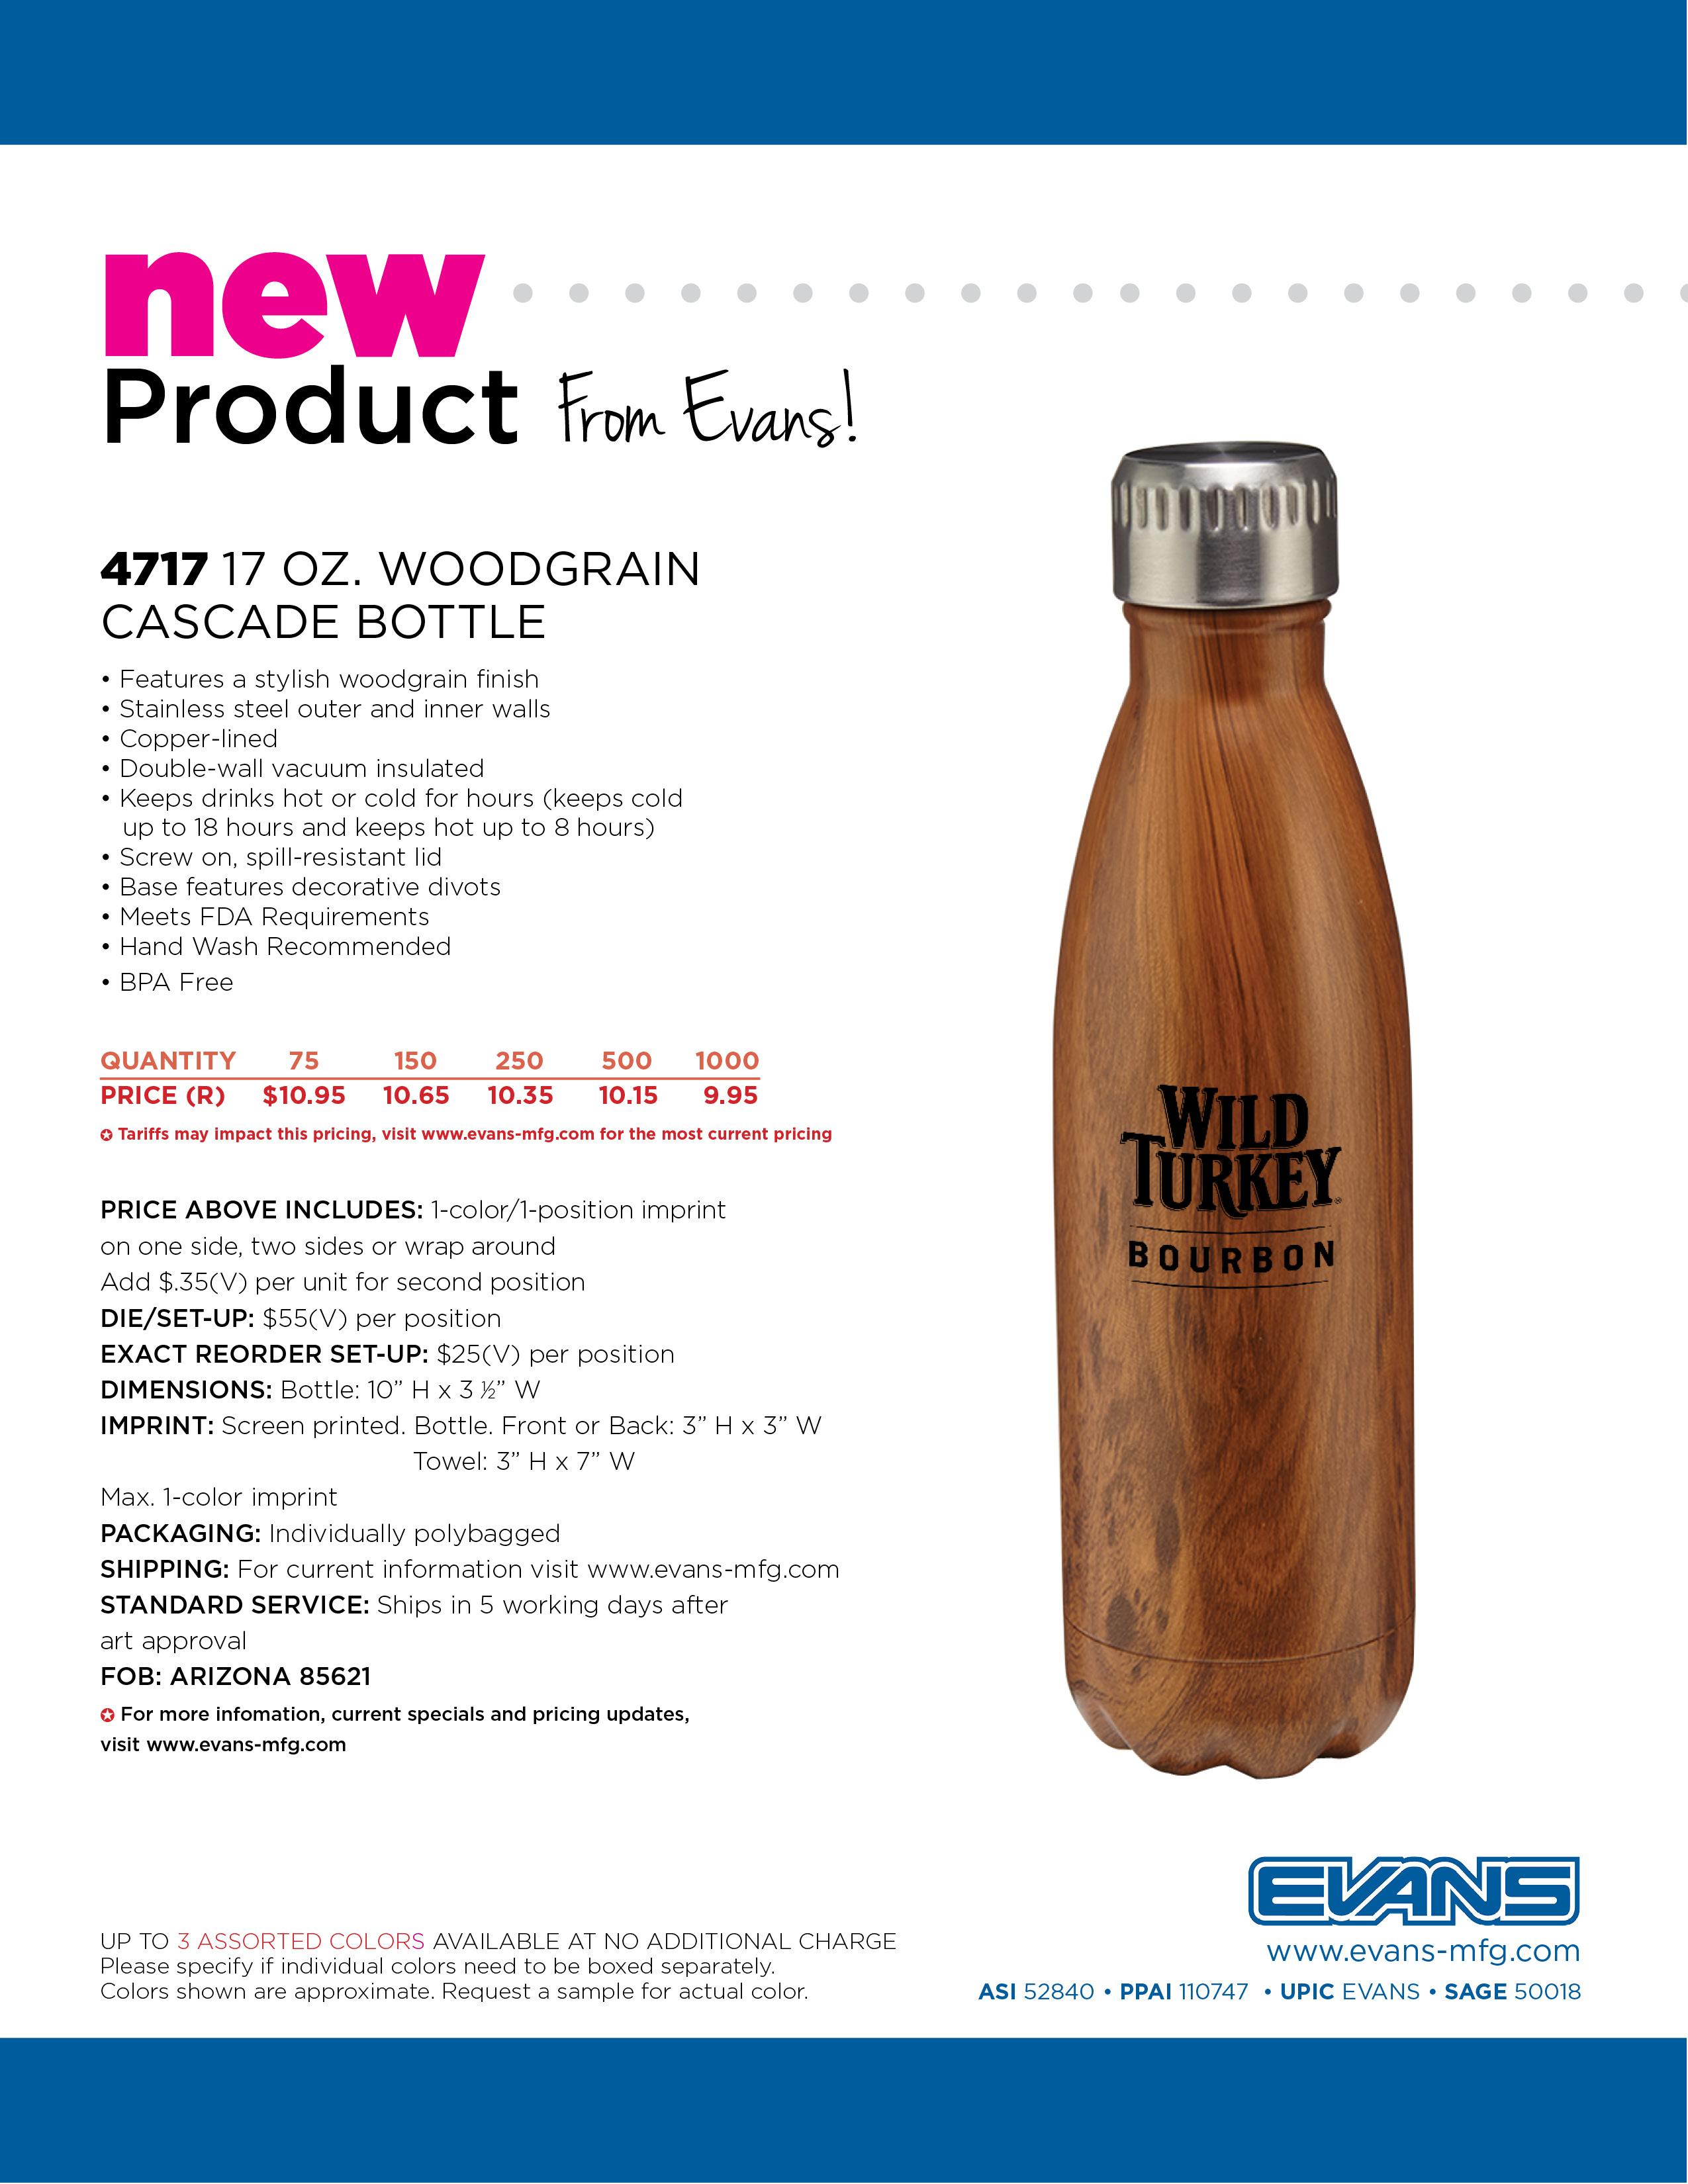 4717 17 oz. Woodgrain Cascade Bottle